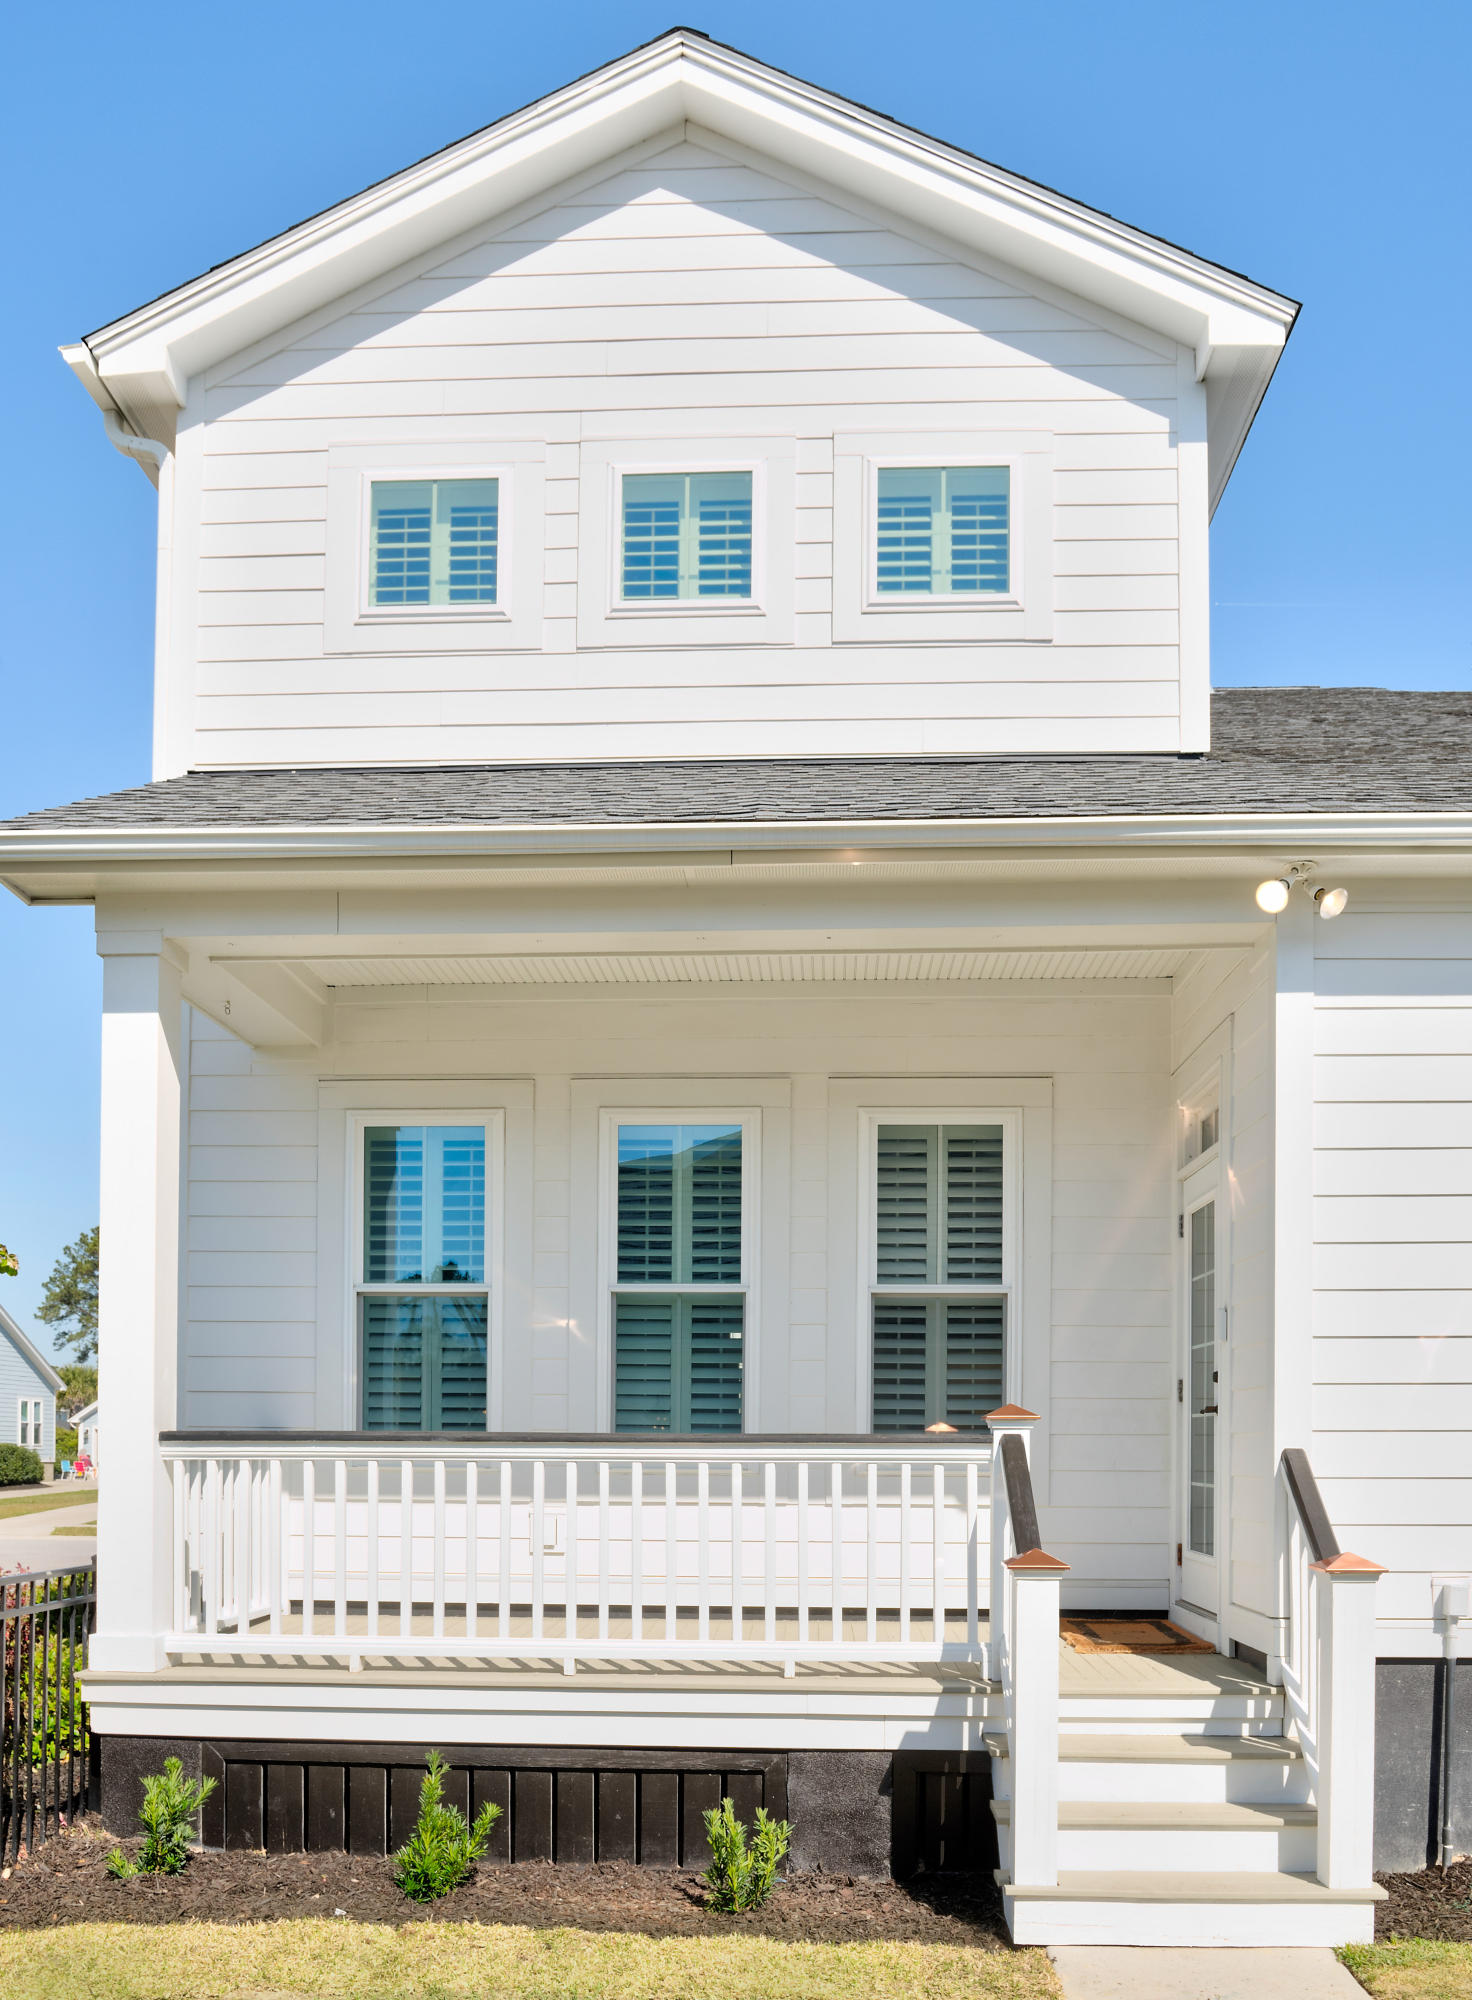 Carolina Park Homes For Sale - 3683 Shutesbury, Mount Pleasant, SC - 0